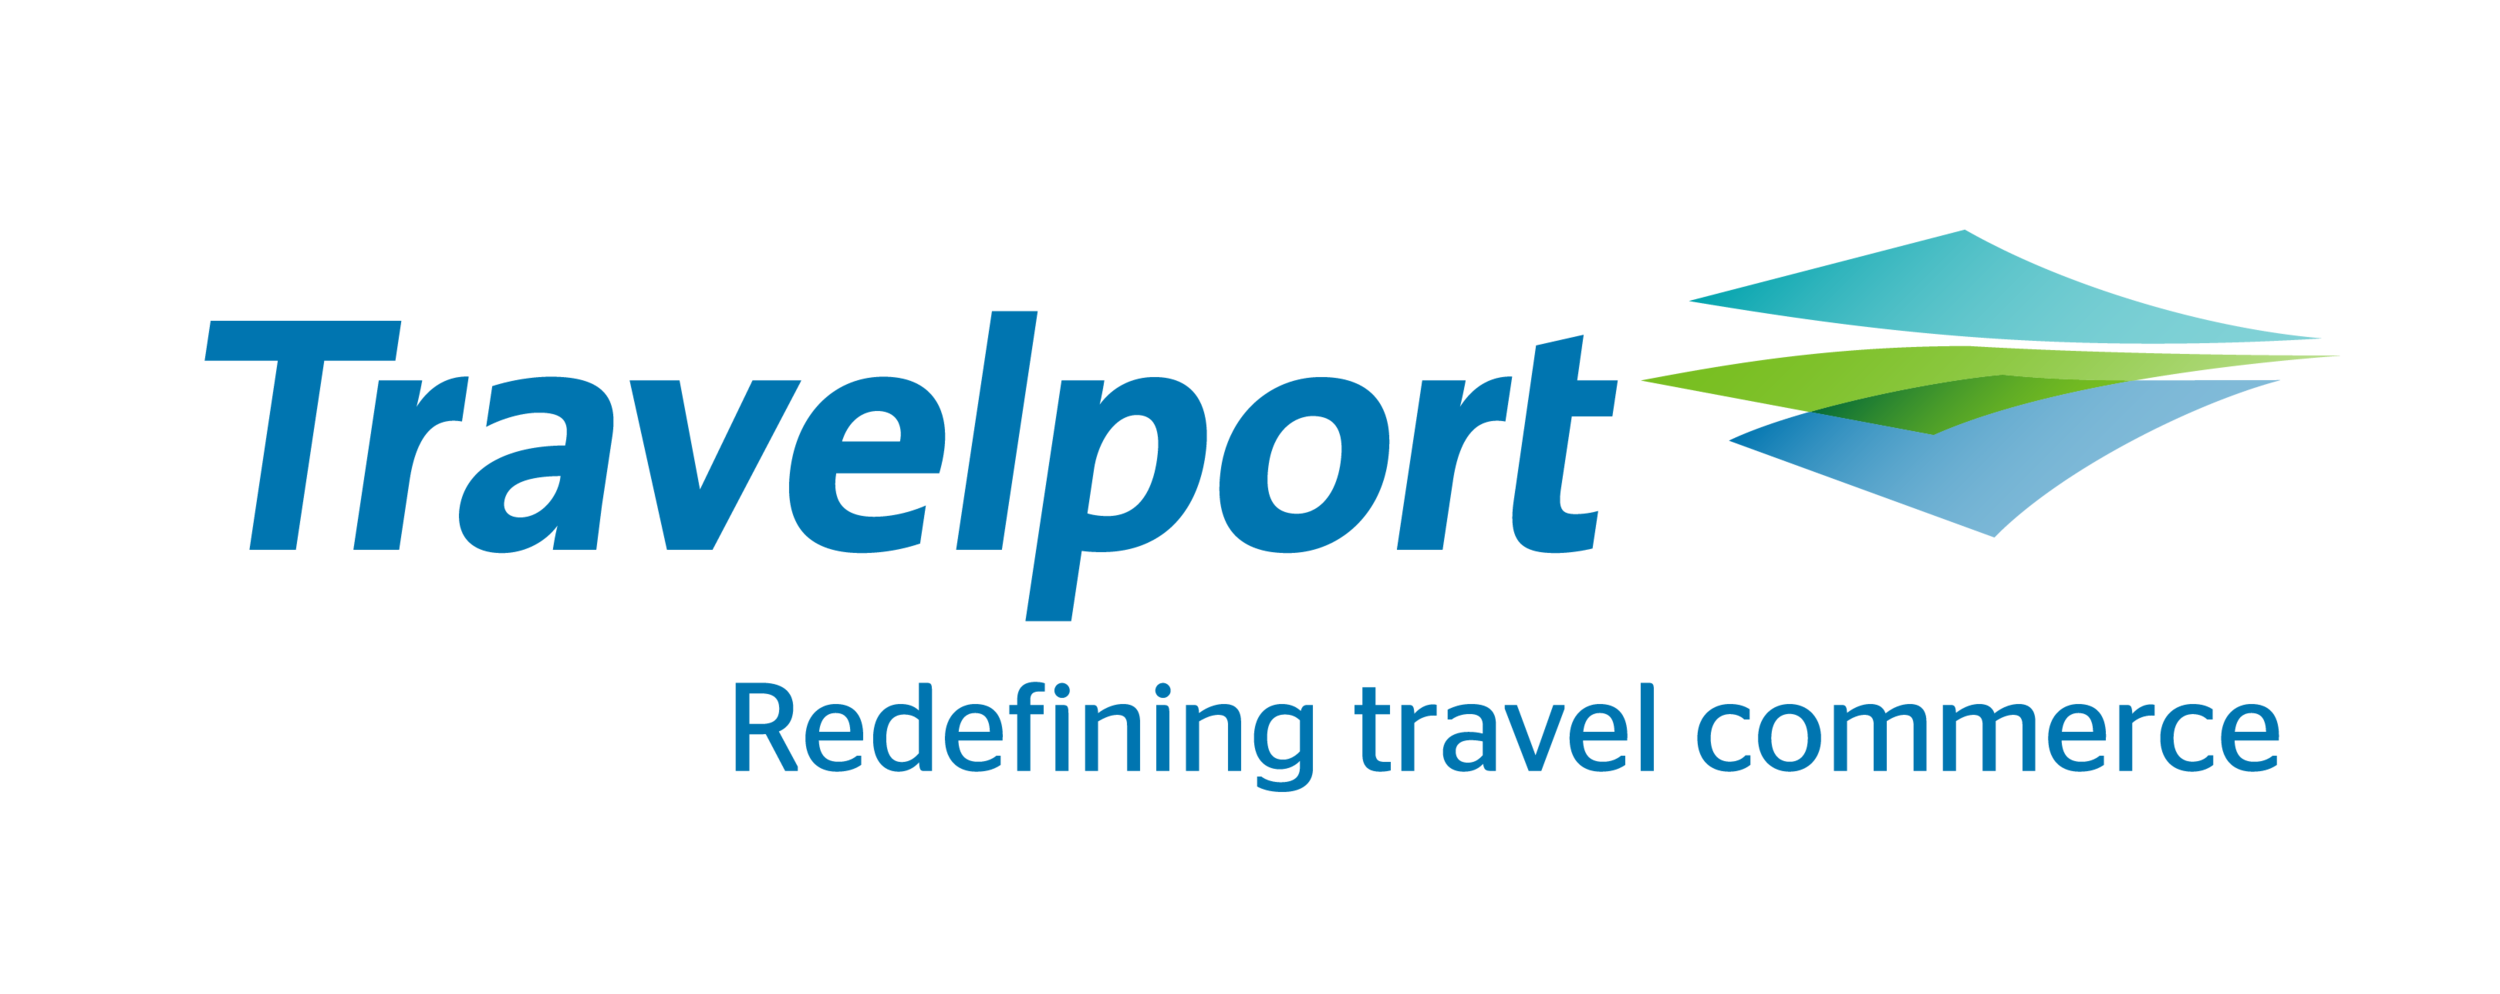 1.  Travelport_logo_s-hr.png